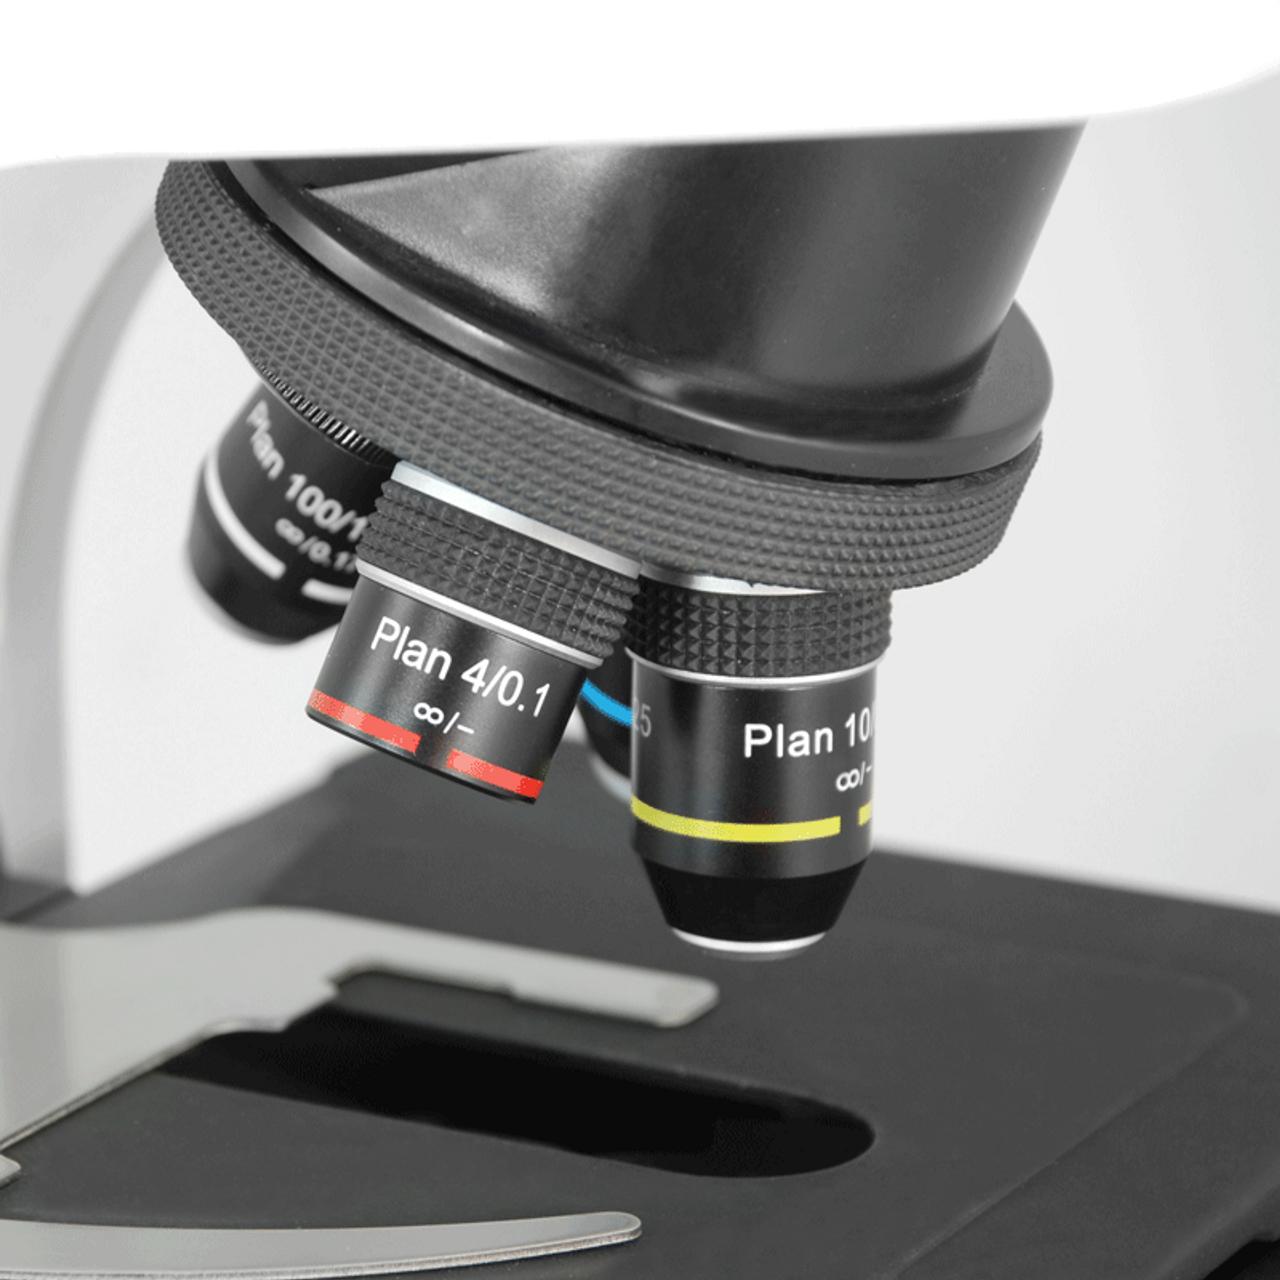 Oil Spring BoliOptics Infinity-Corrected Plan Fluor Achromatic Microscope Objective Lens Set 4X 10X 40X 100X FM13013031